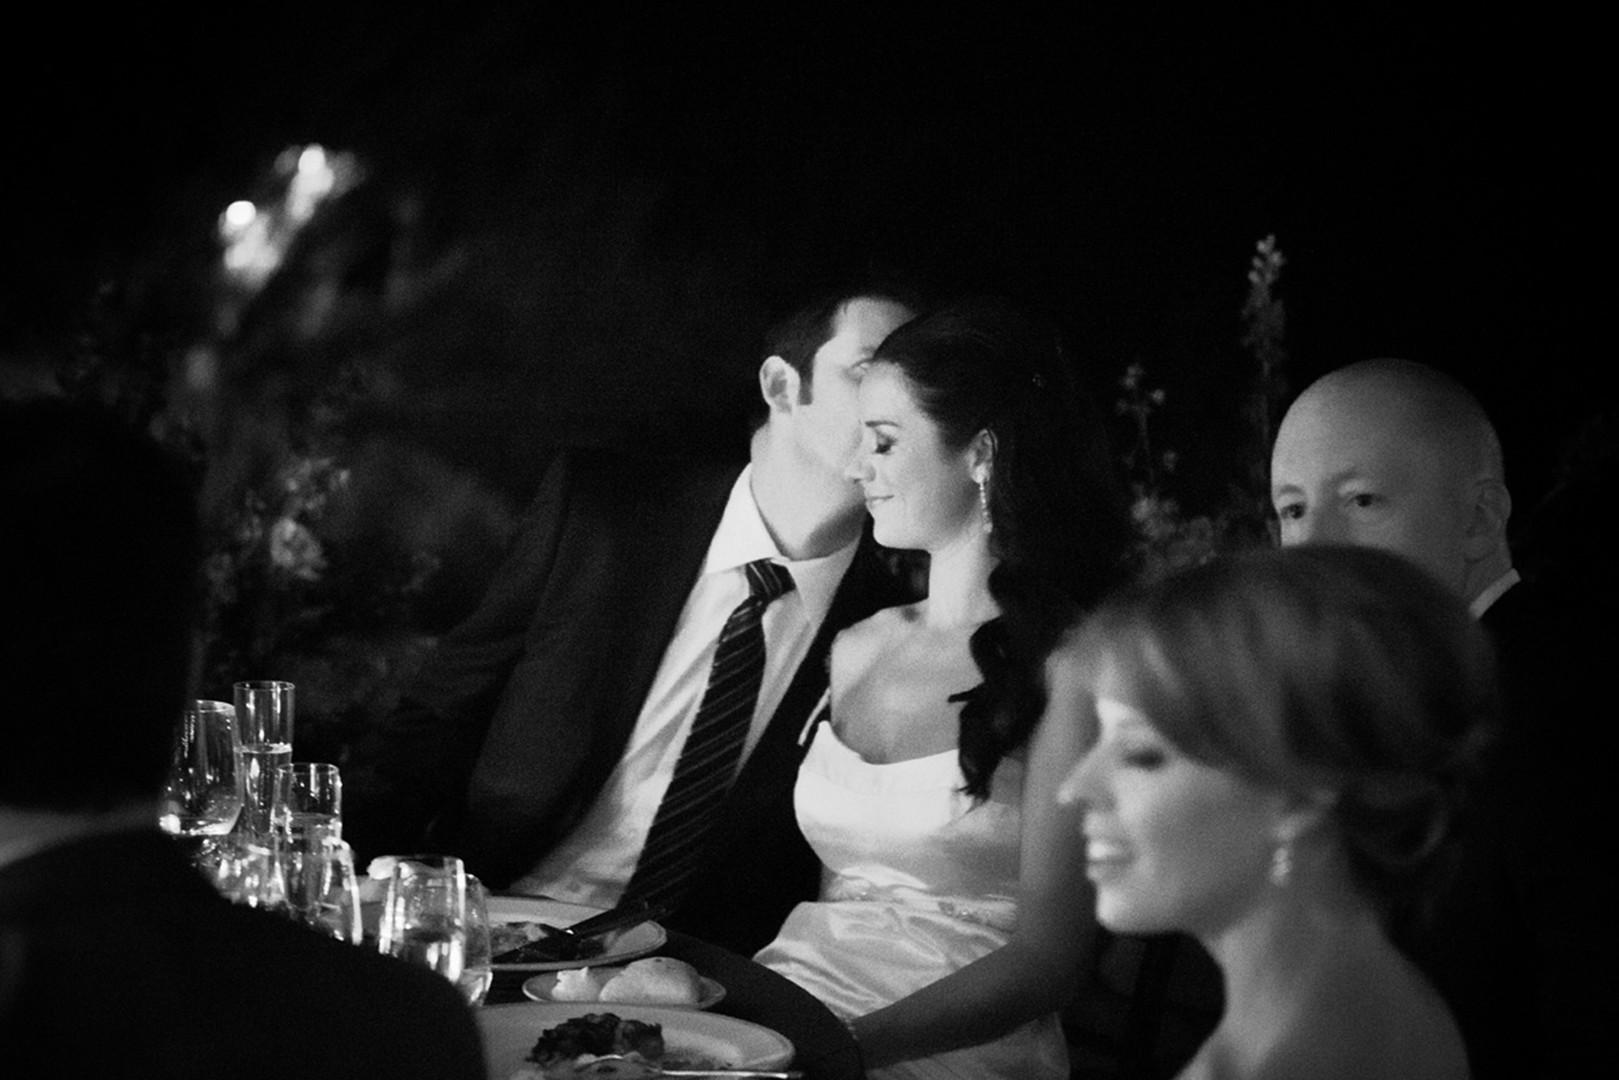 066_jennifer_bowen_fav_wedding_images_ar